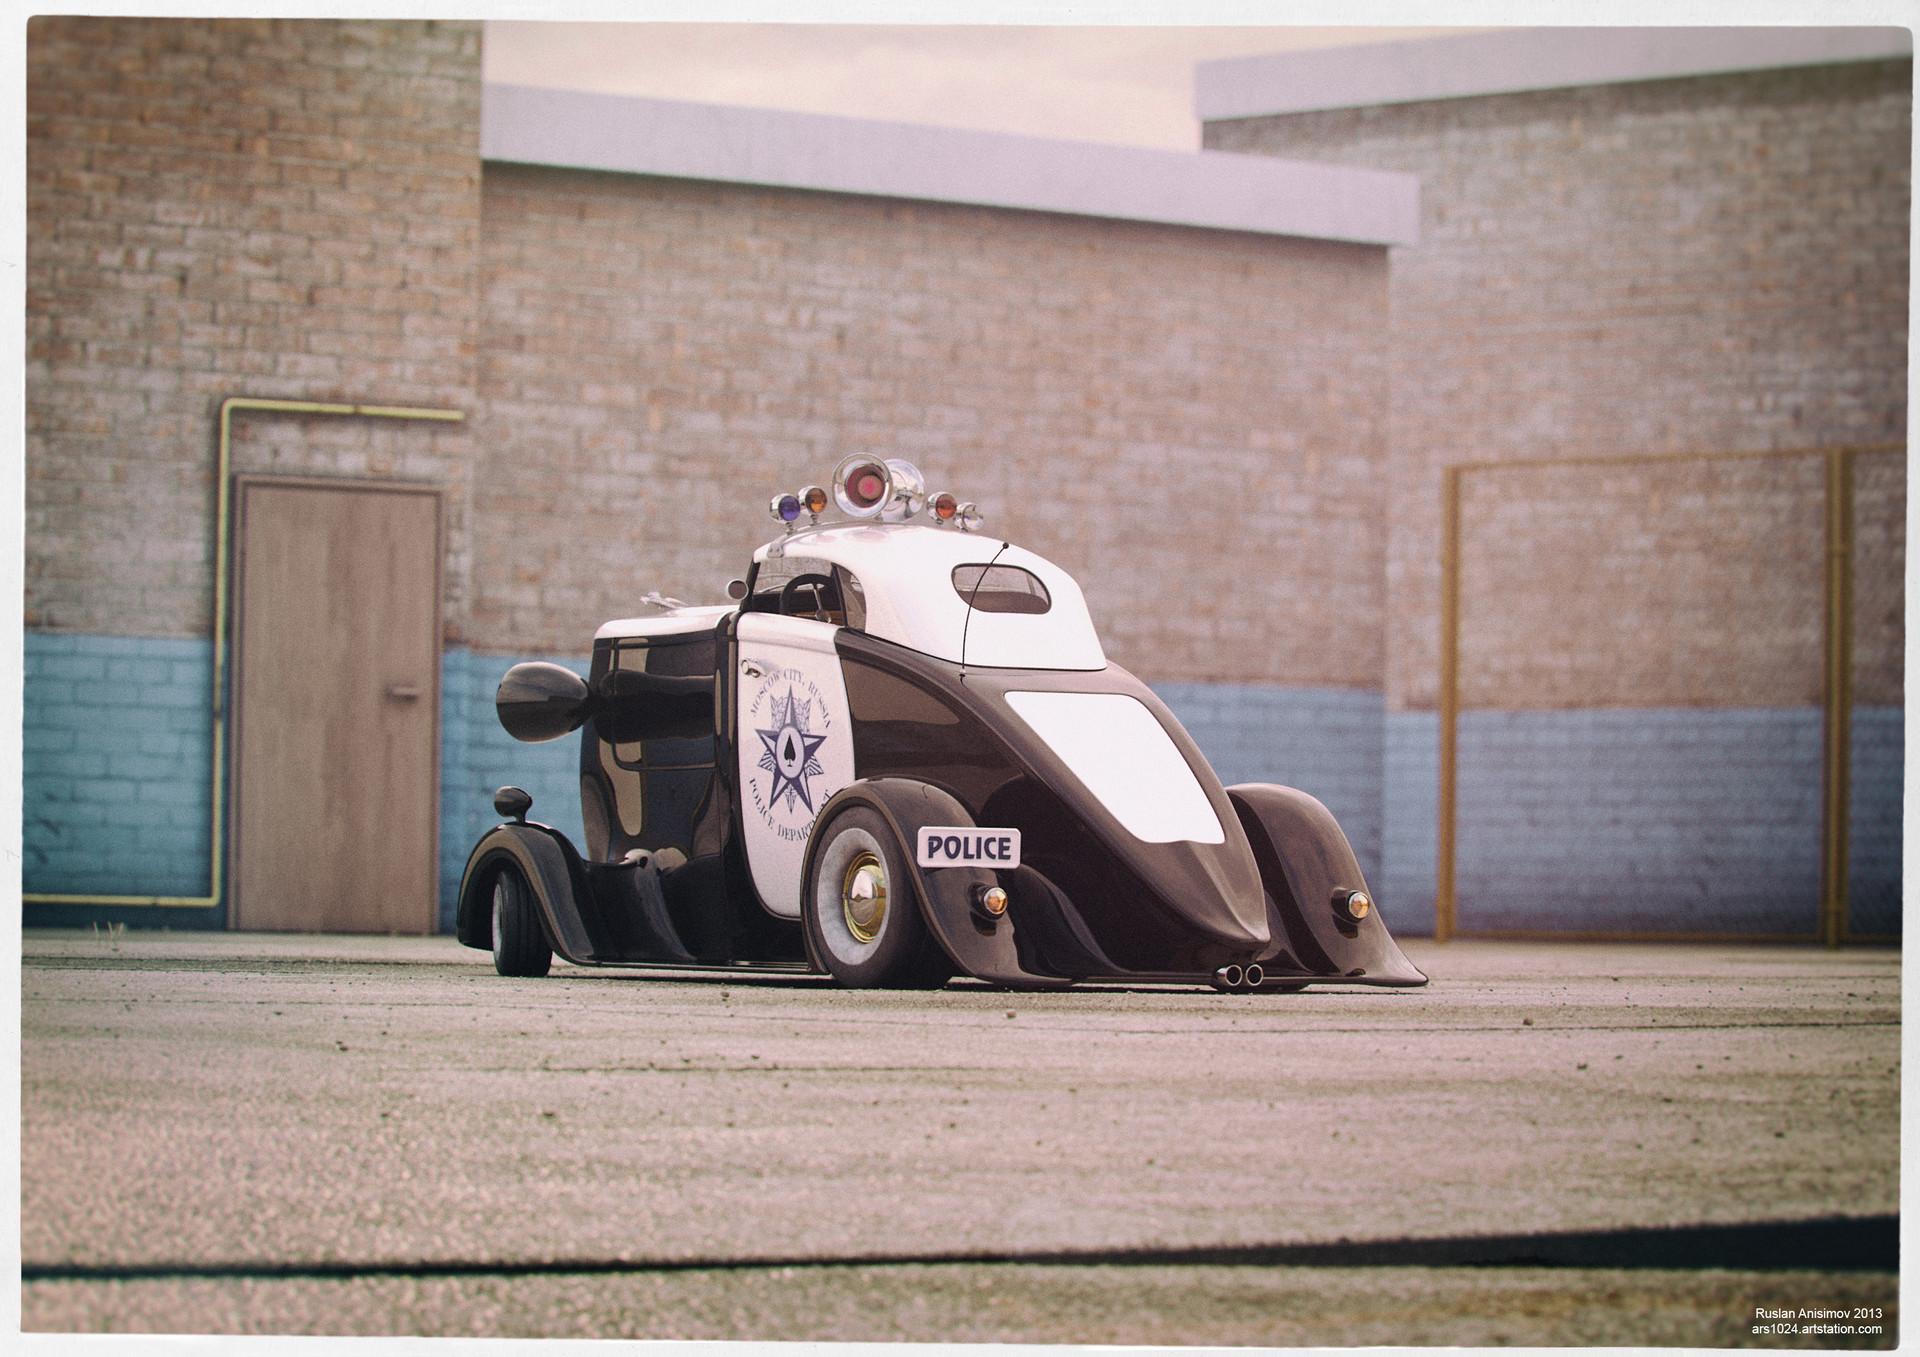 Ruslan anisimov 2013 policecar03